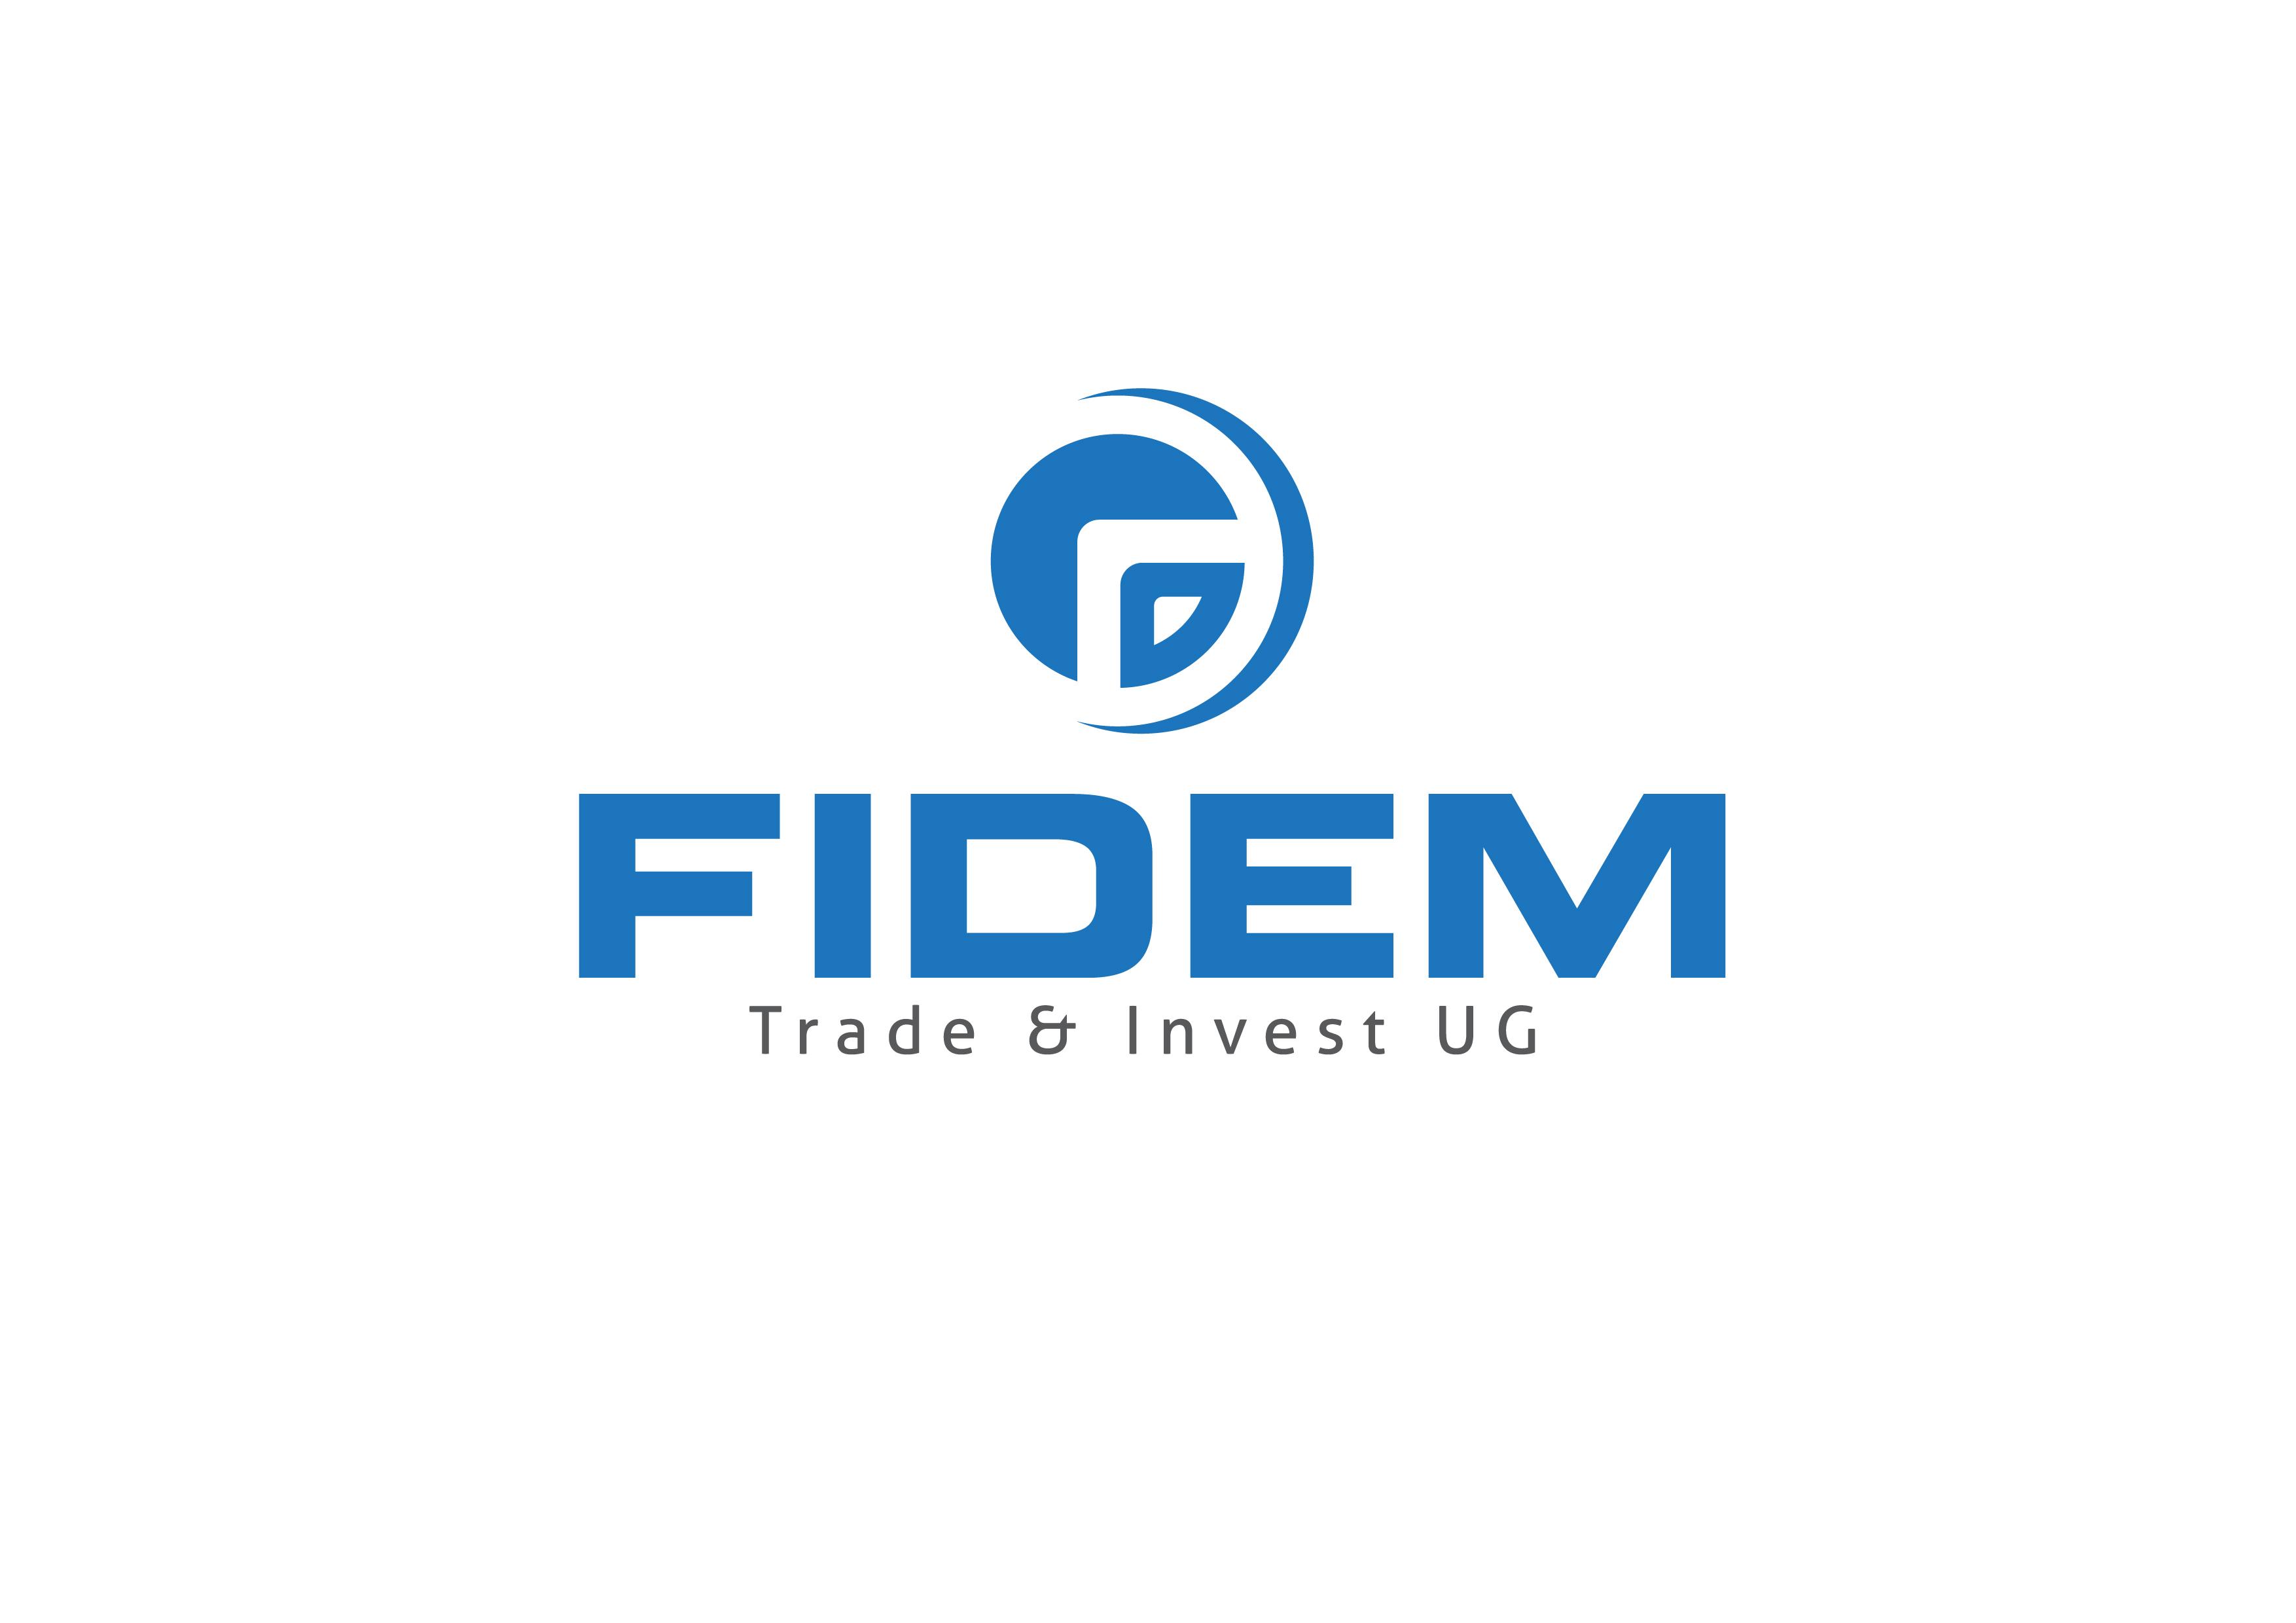 Logo Design by 3draw - Entry No. 490 in the Logo Design Contest Professional Logo Design for FIDEM Trade & Invest UG.